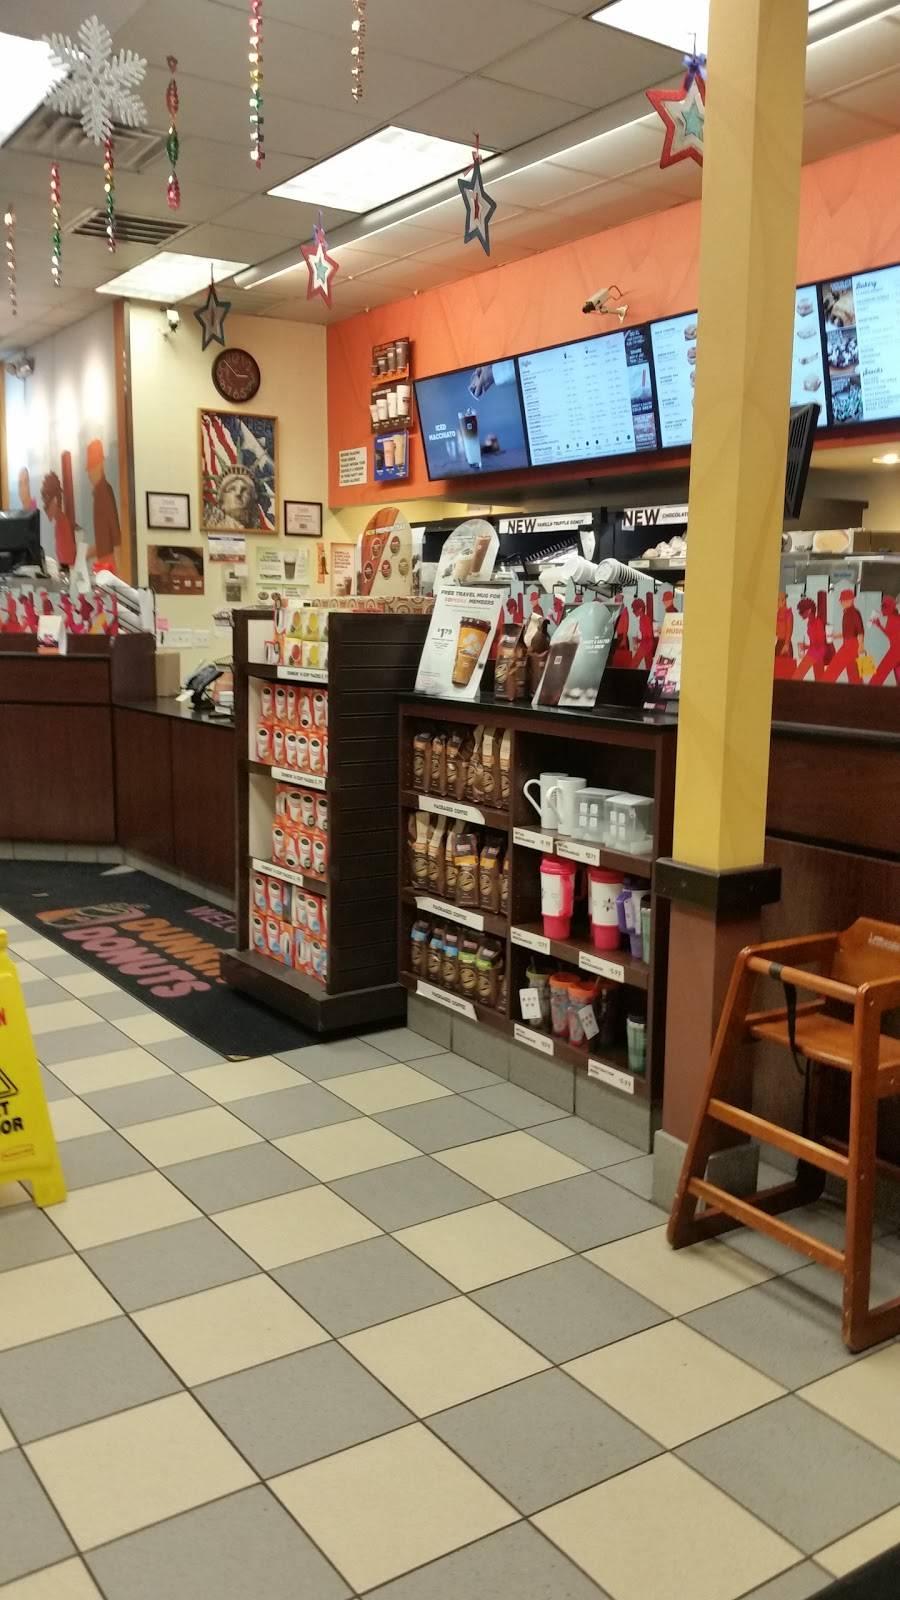 Dunkin Donuts   cafe   930 US-22, Somerville, NJ 08876, USA   9082318097 OR +1 908-231-8097